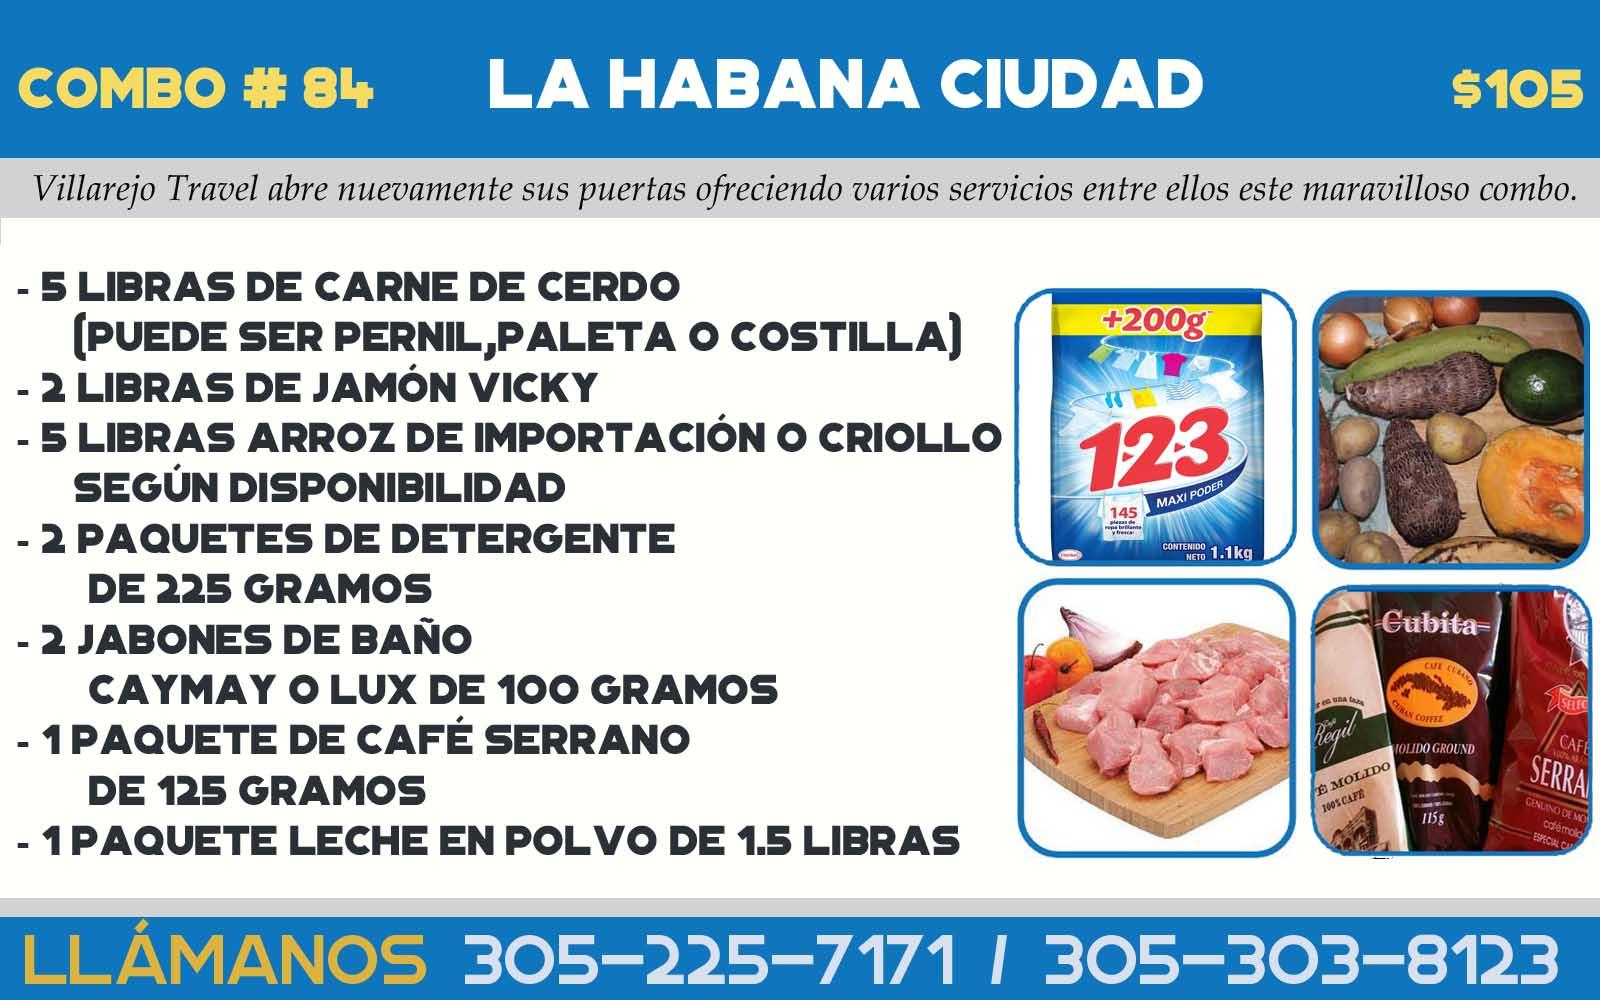 COMBO # 84 LA HABANA CIUDAD